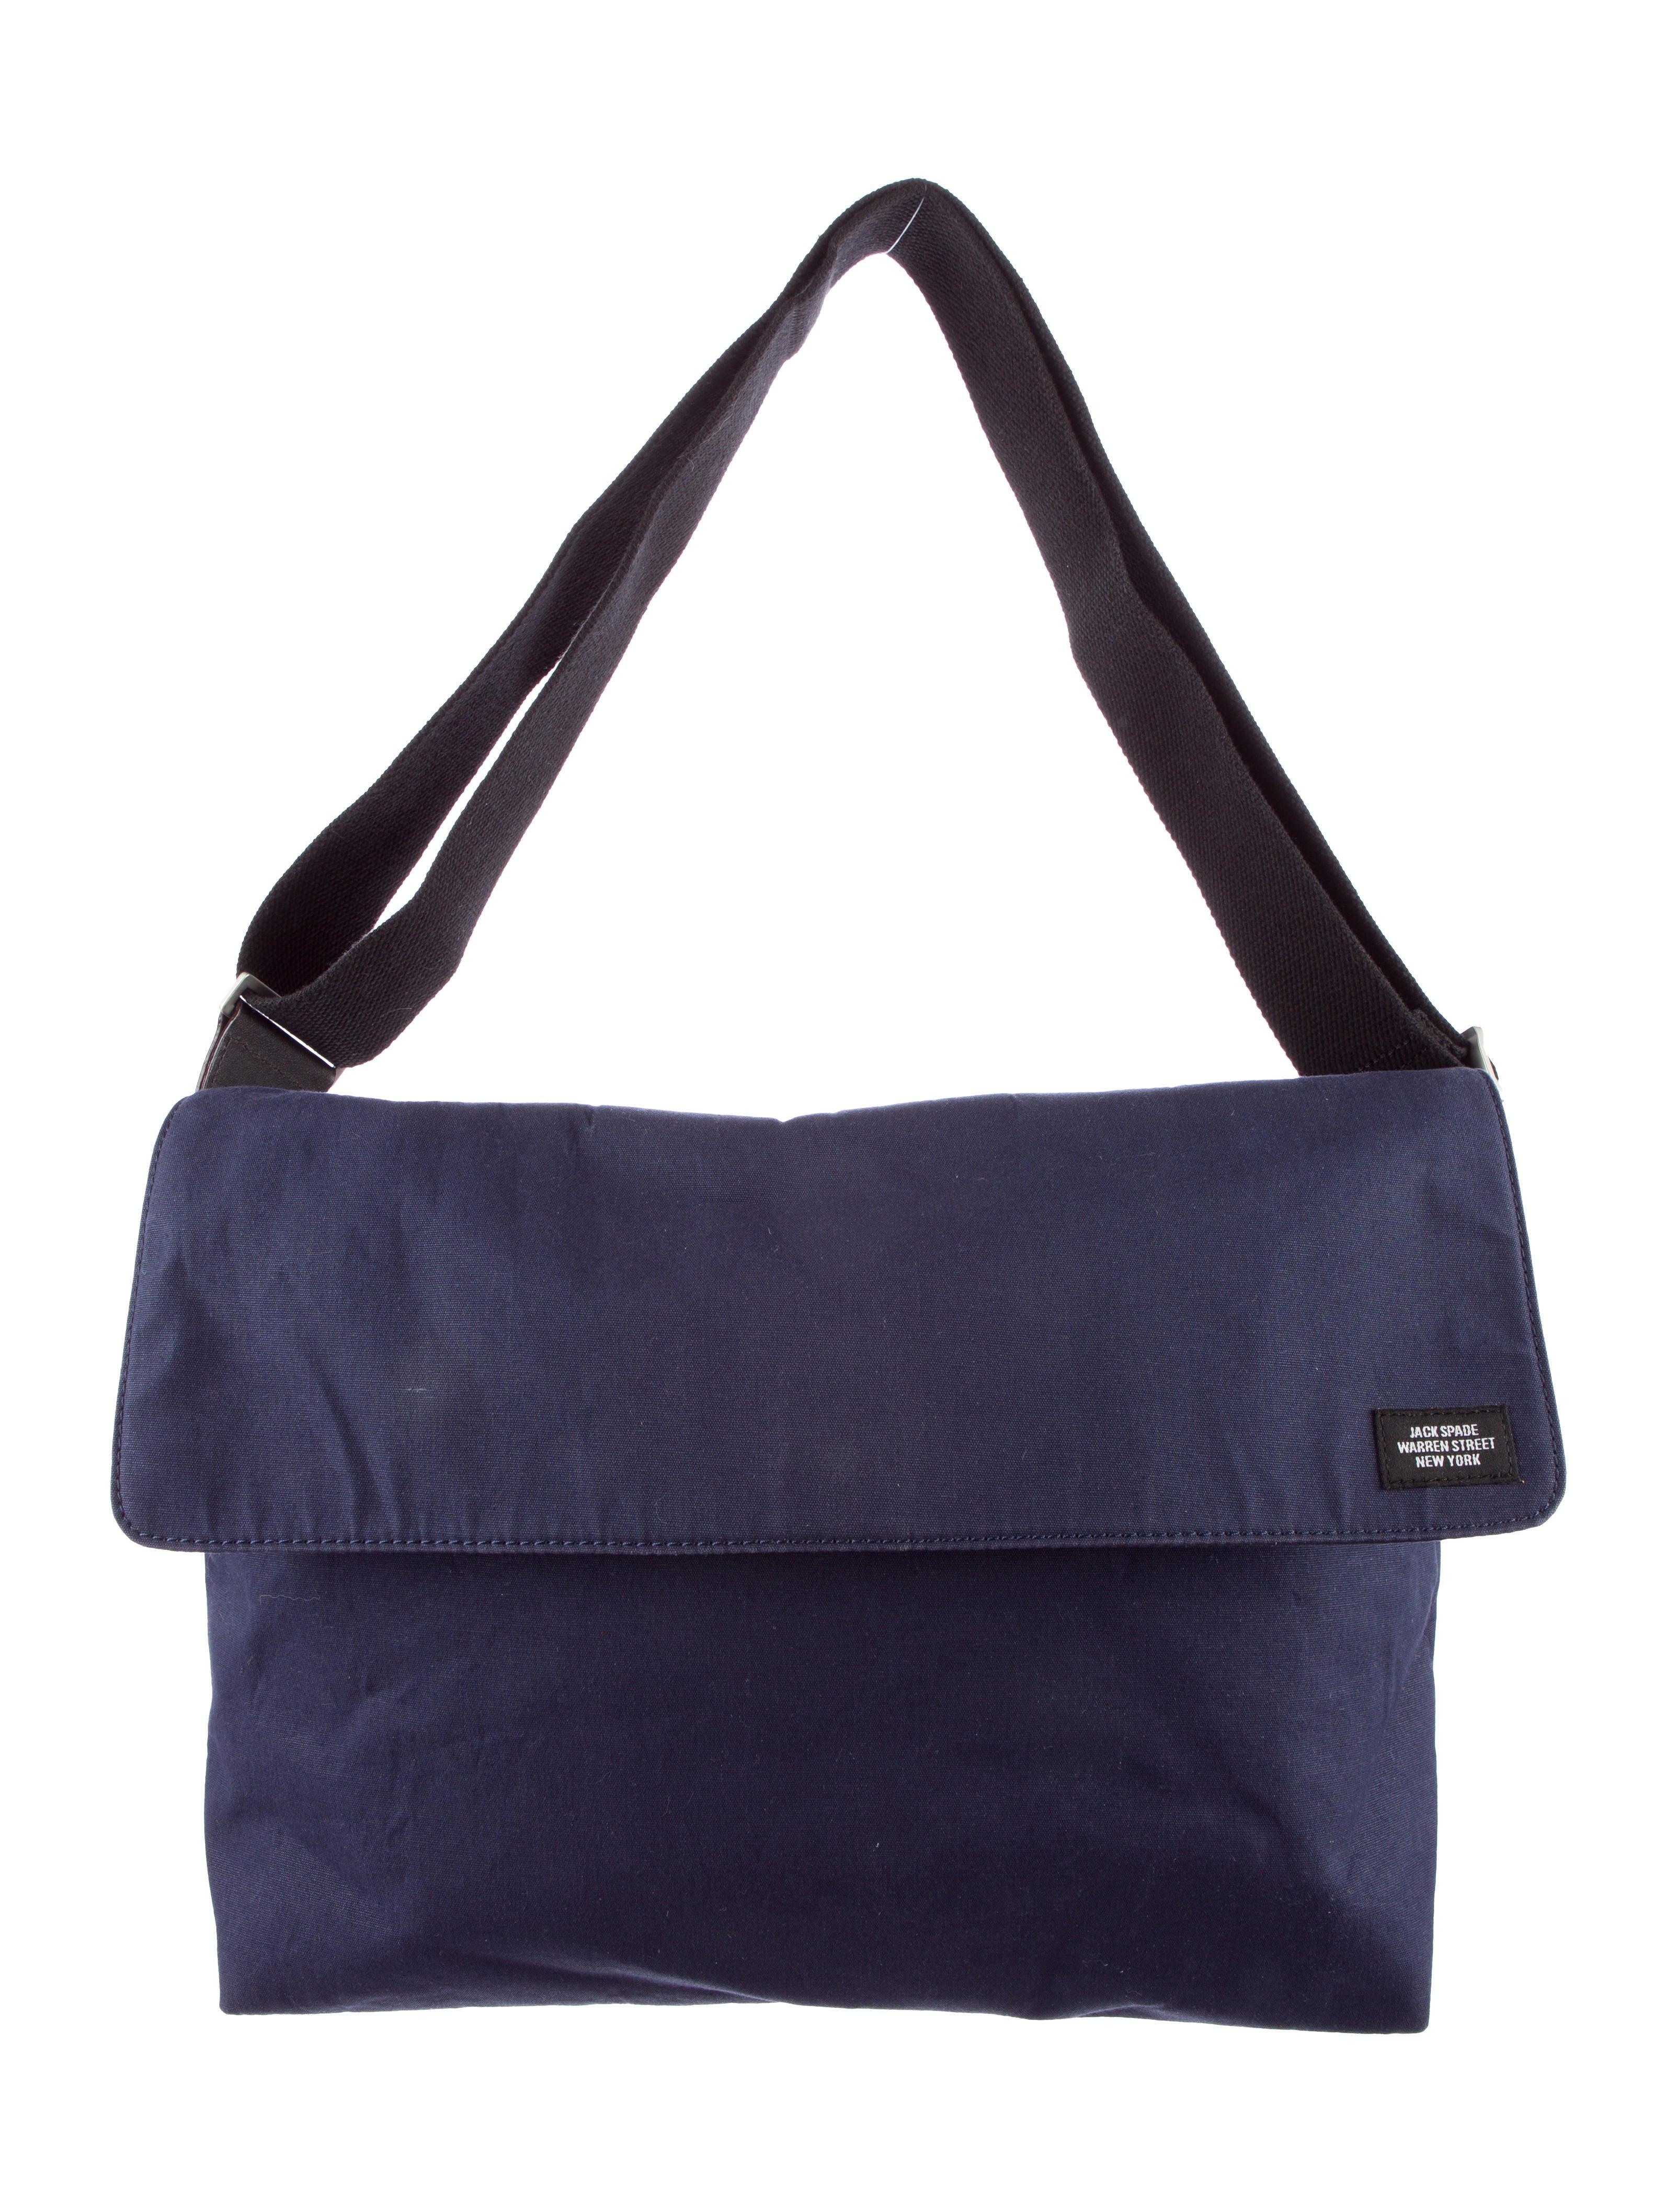 Jack Spade Canvas Messenger Bag Bags